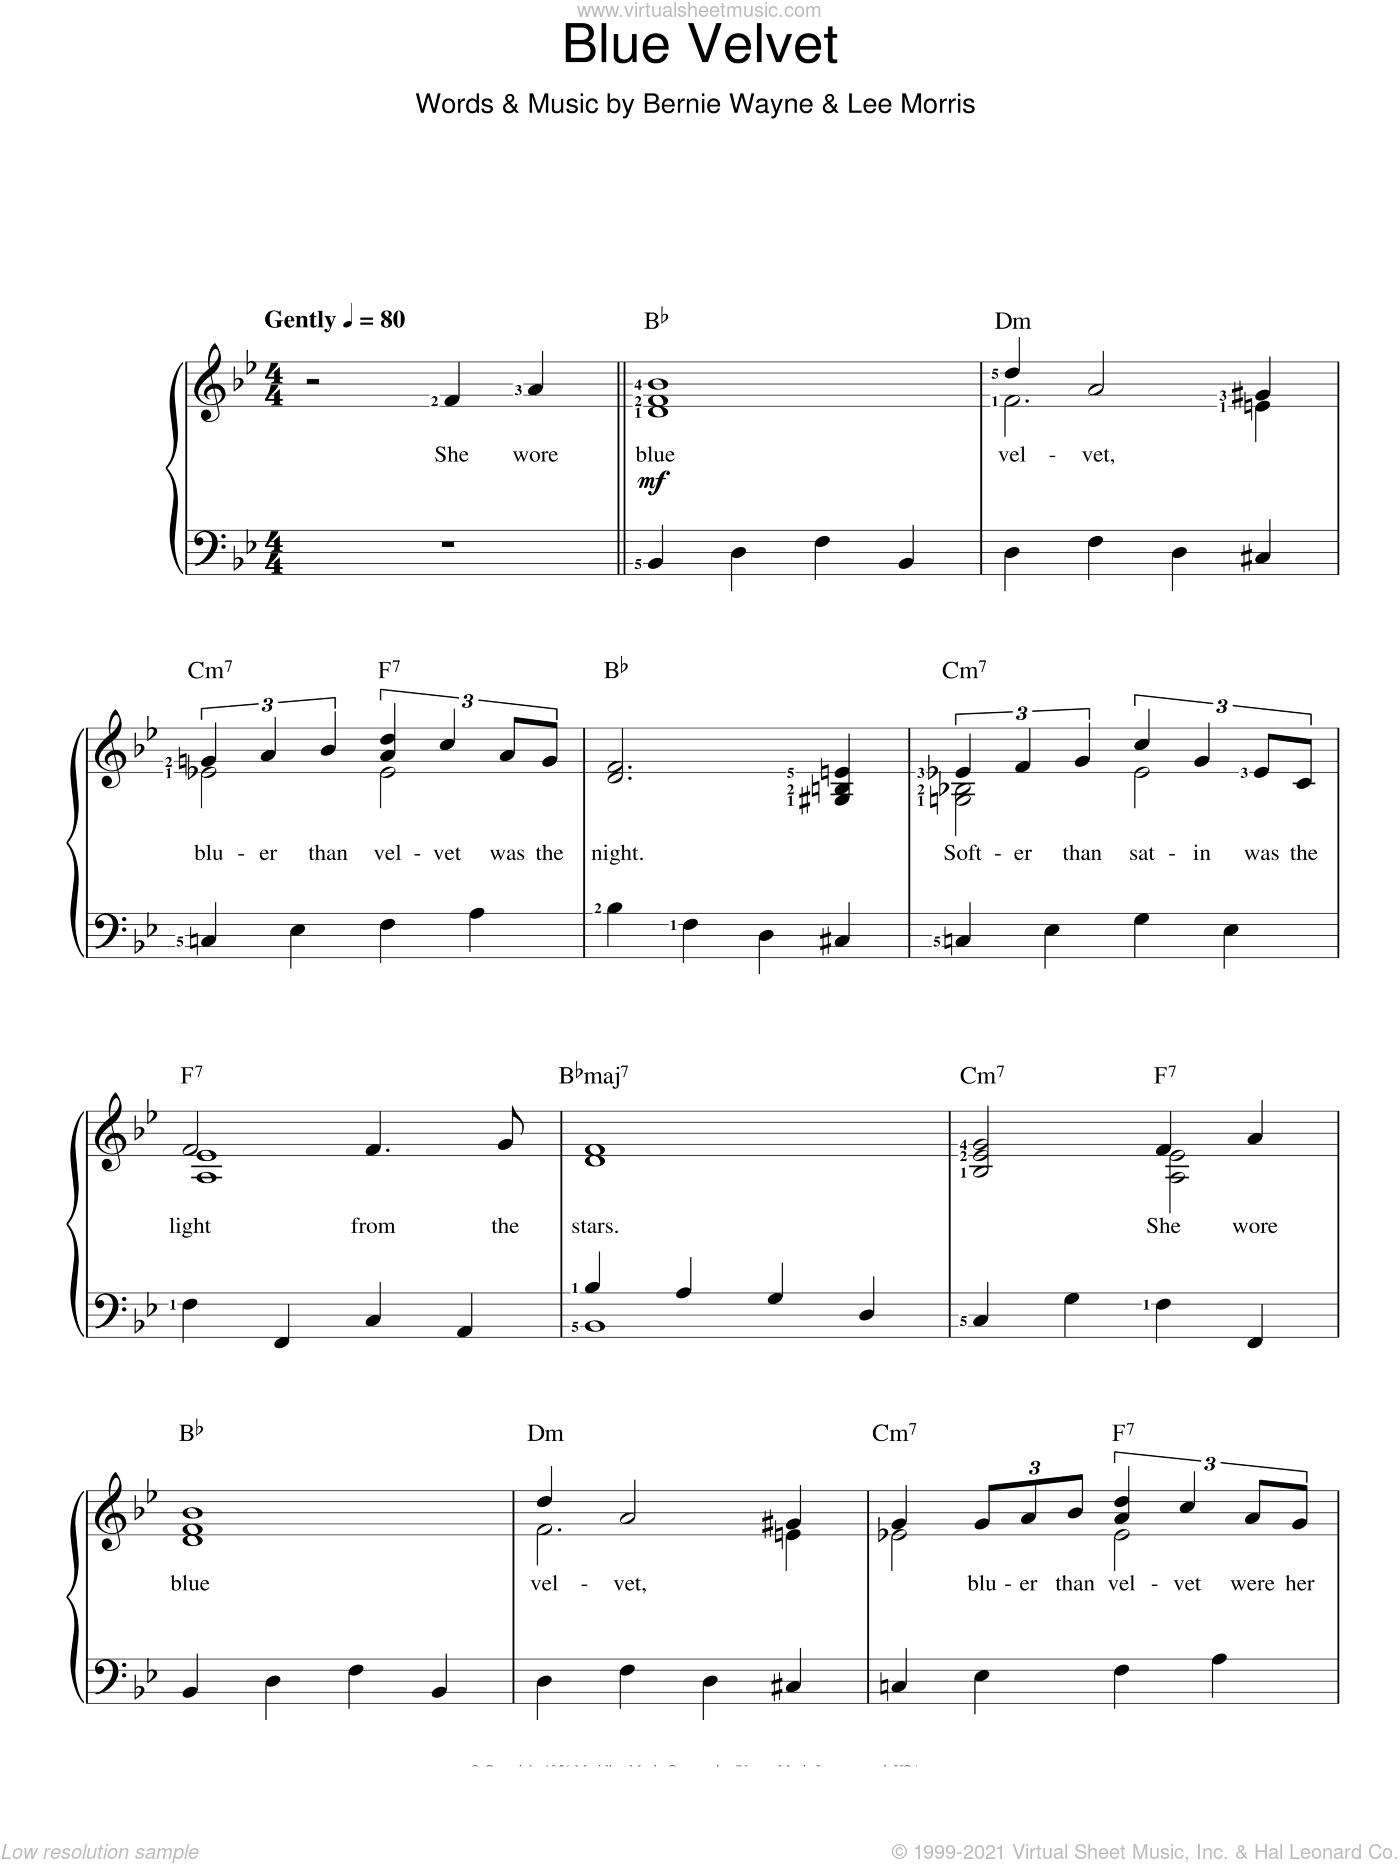 Vinton - Blue Velvet sheet music for voice and piano [PDF]